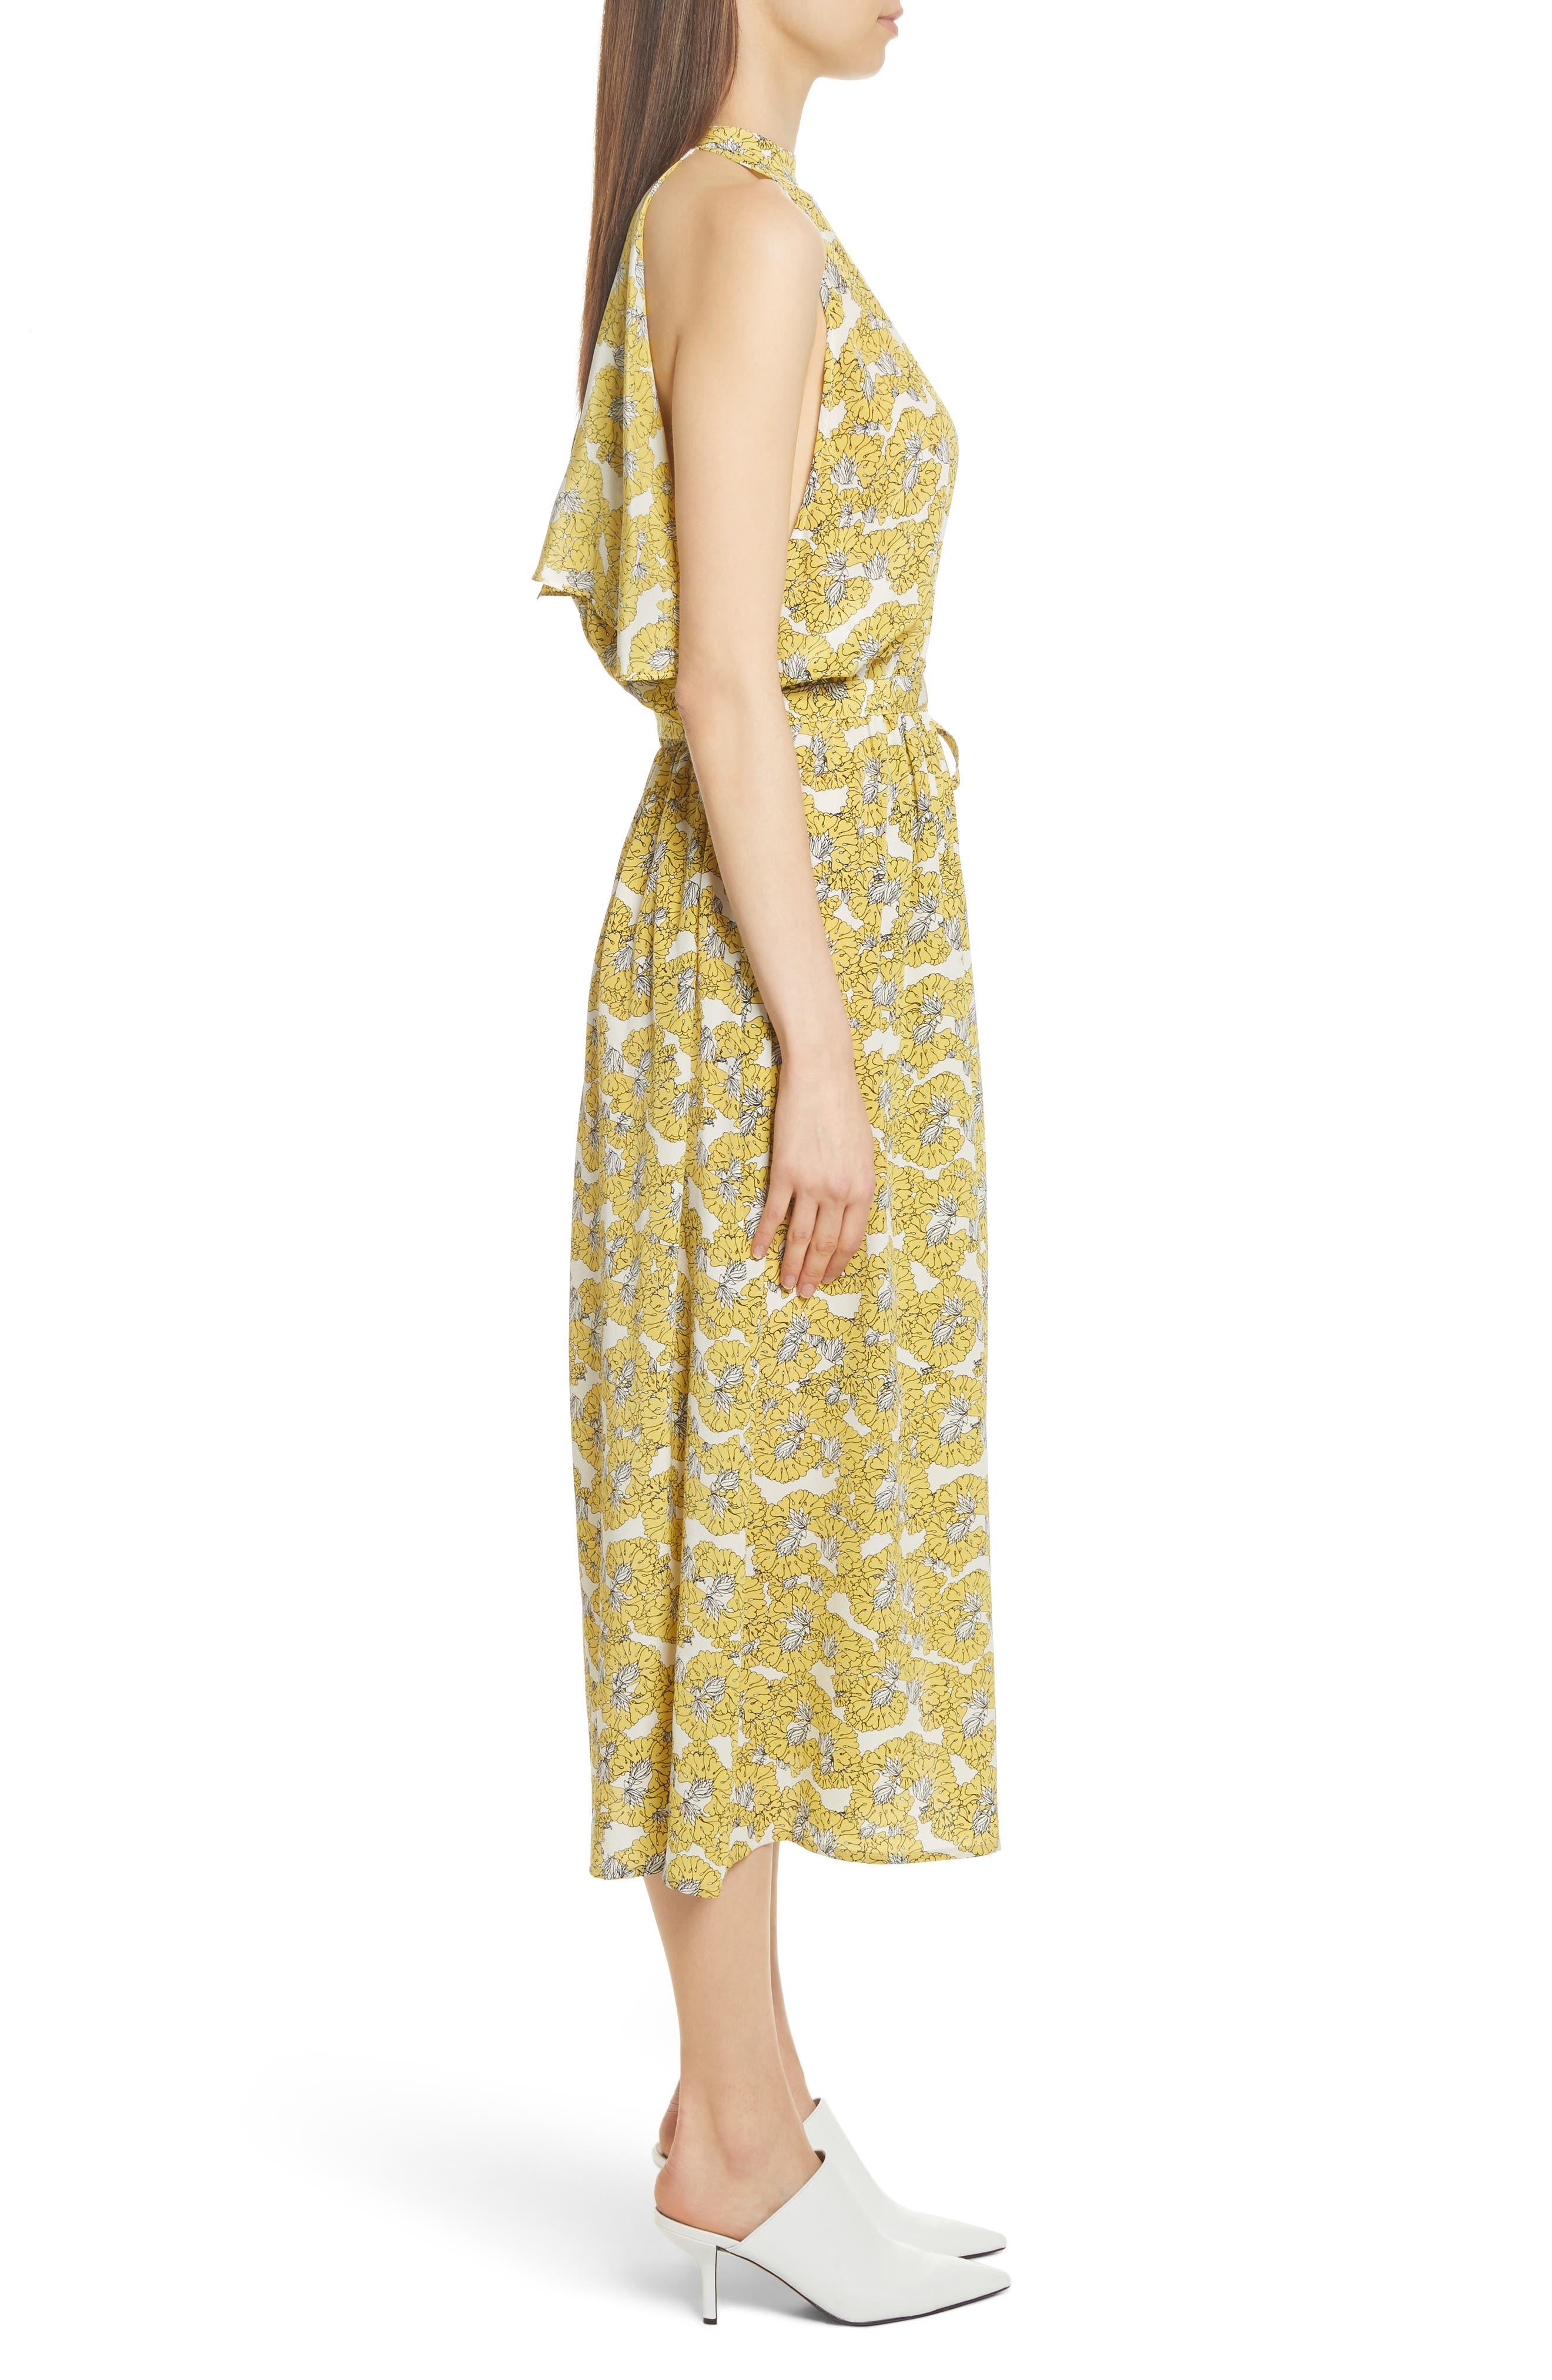 Dania Floral Print Dress,                             Alternate thumbnail 3, color,                             730